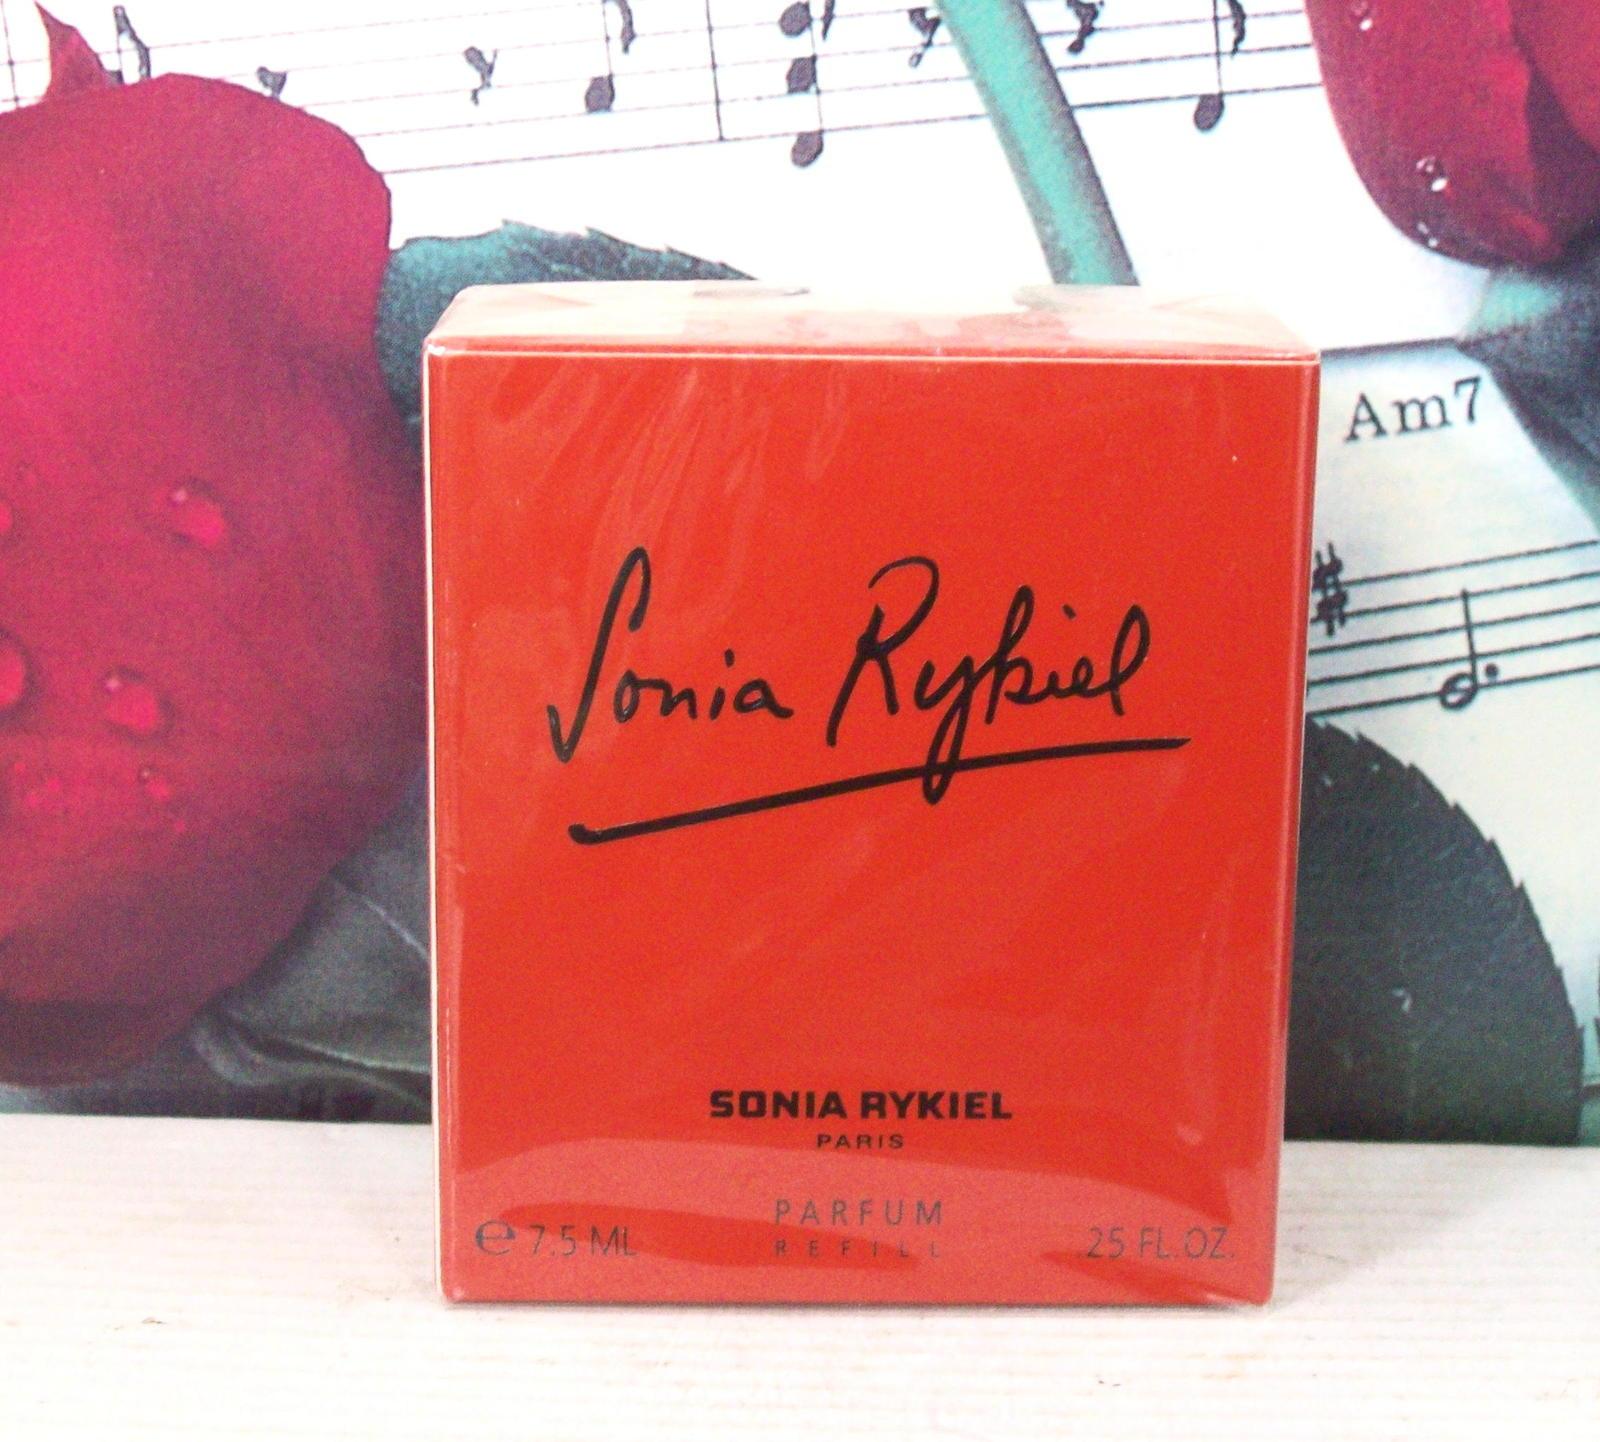 Sonia Rykiel By Sonia Rykiel Parfum / Perfume 0.25 FL. OZ. NWB - $159.99